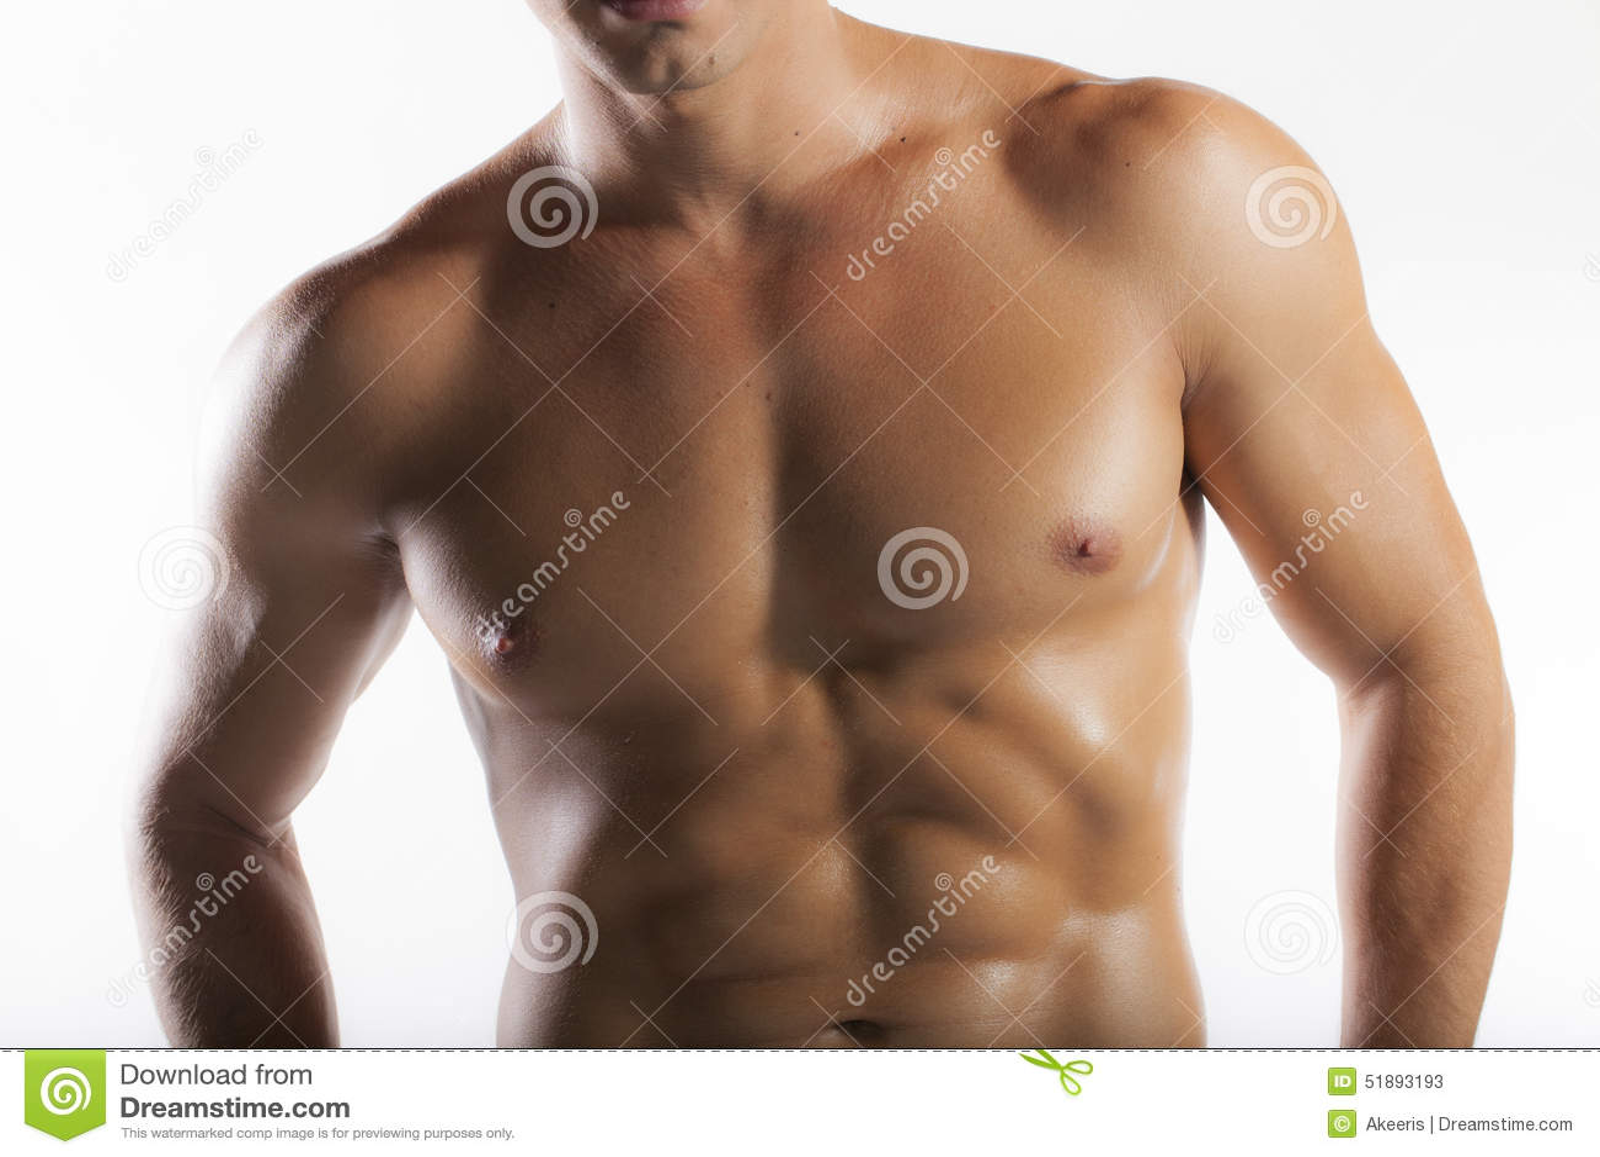 Join men body show naked valuable